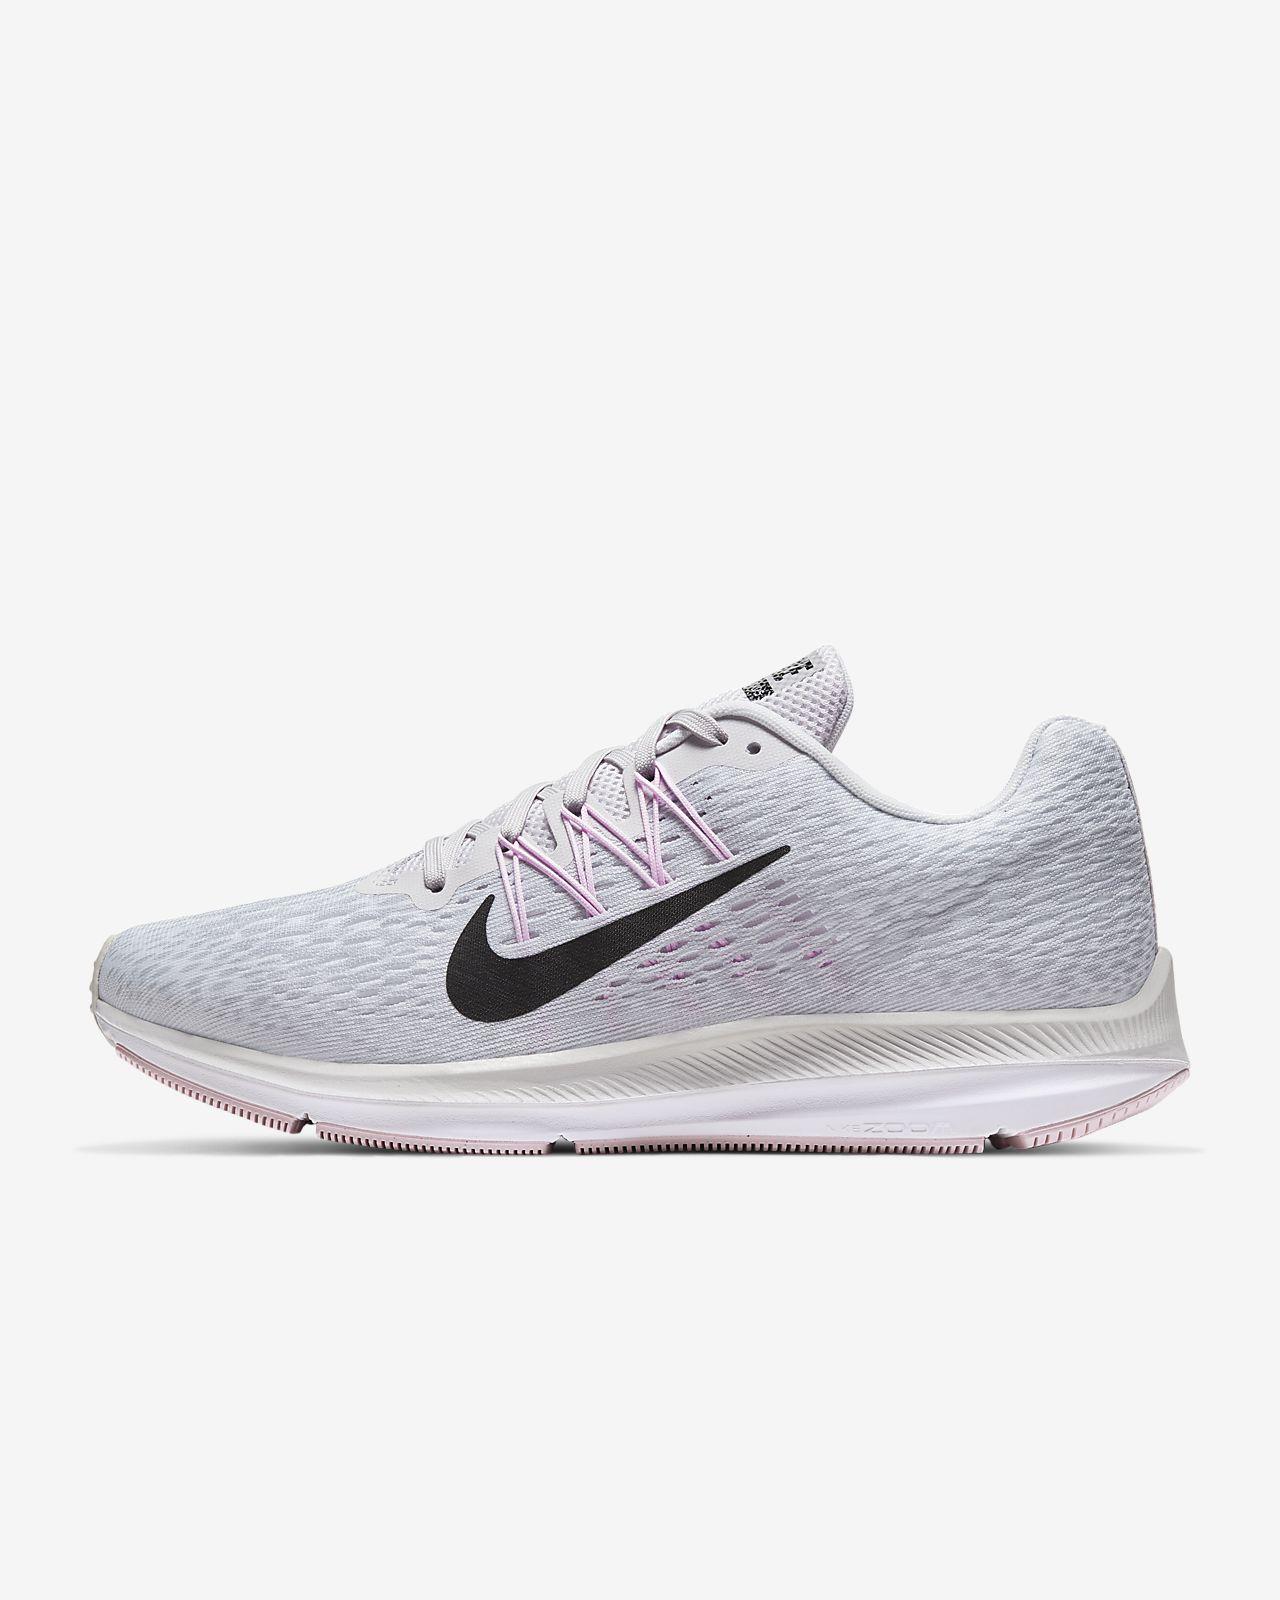 Nike Air Zoom Winflo 5 Sabatilles de running - Dona